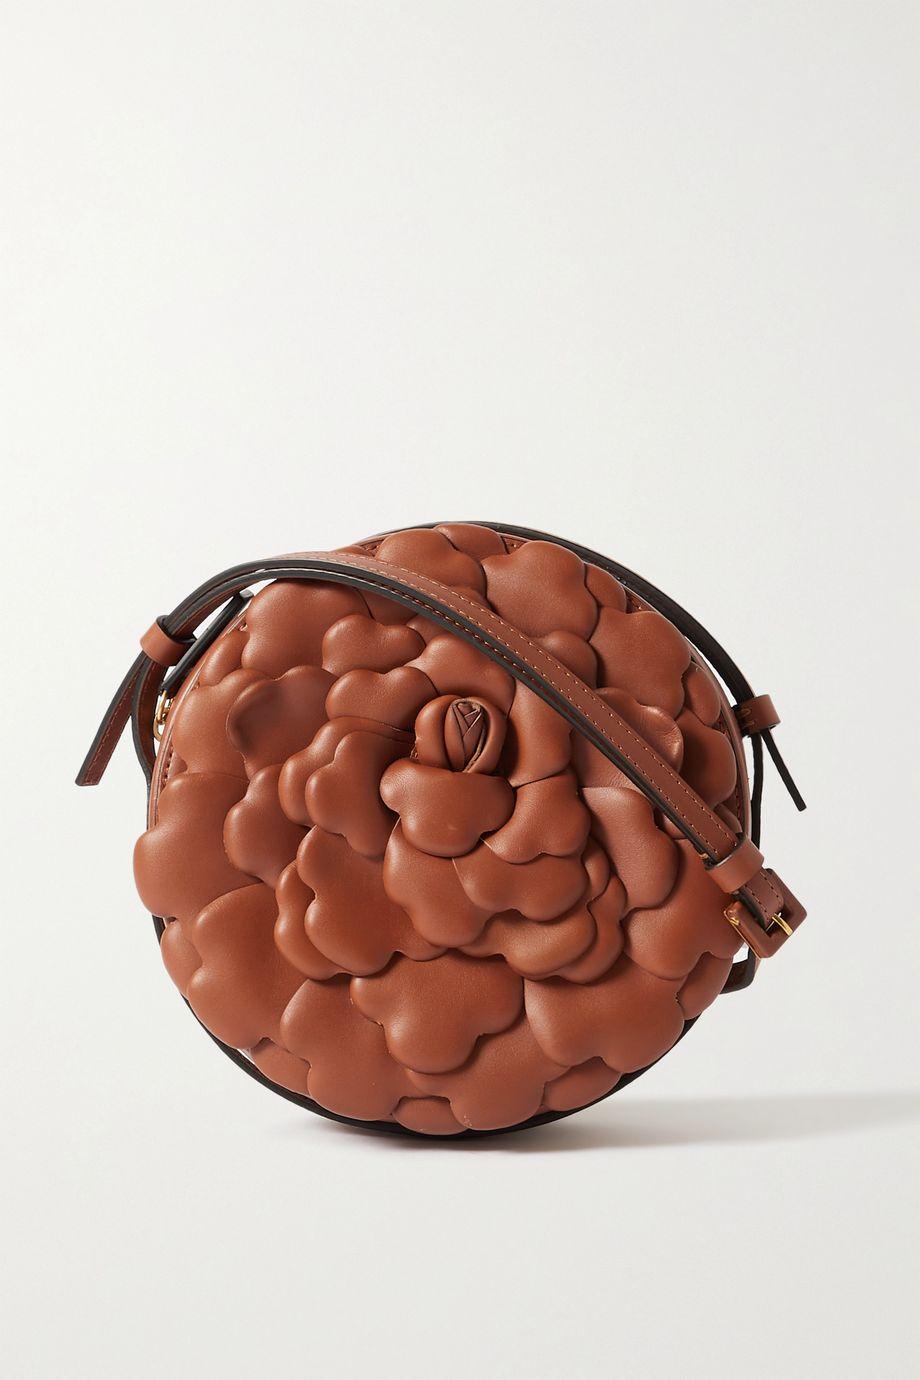 Valentino Sac porté épaule en cuir 03 Rose Edition Atelier Valentino Garavani